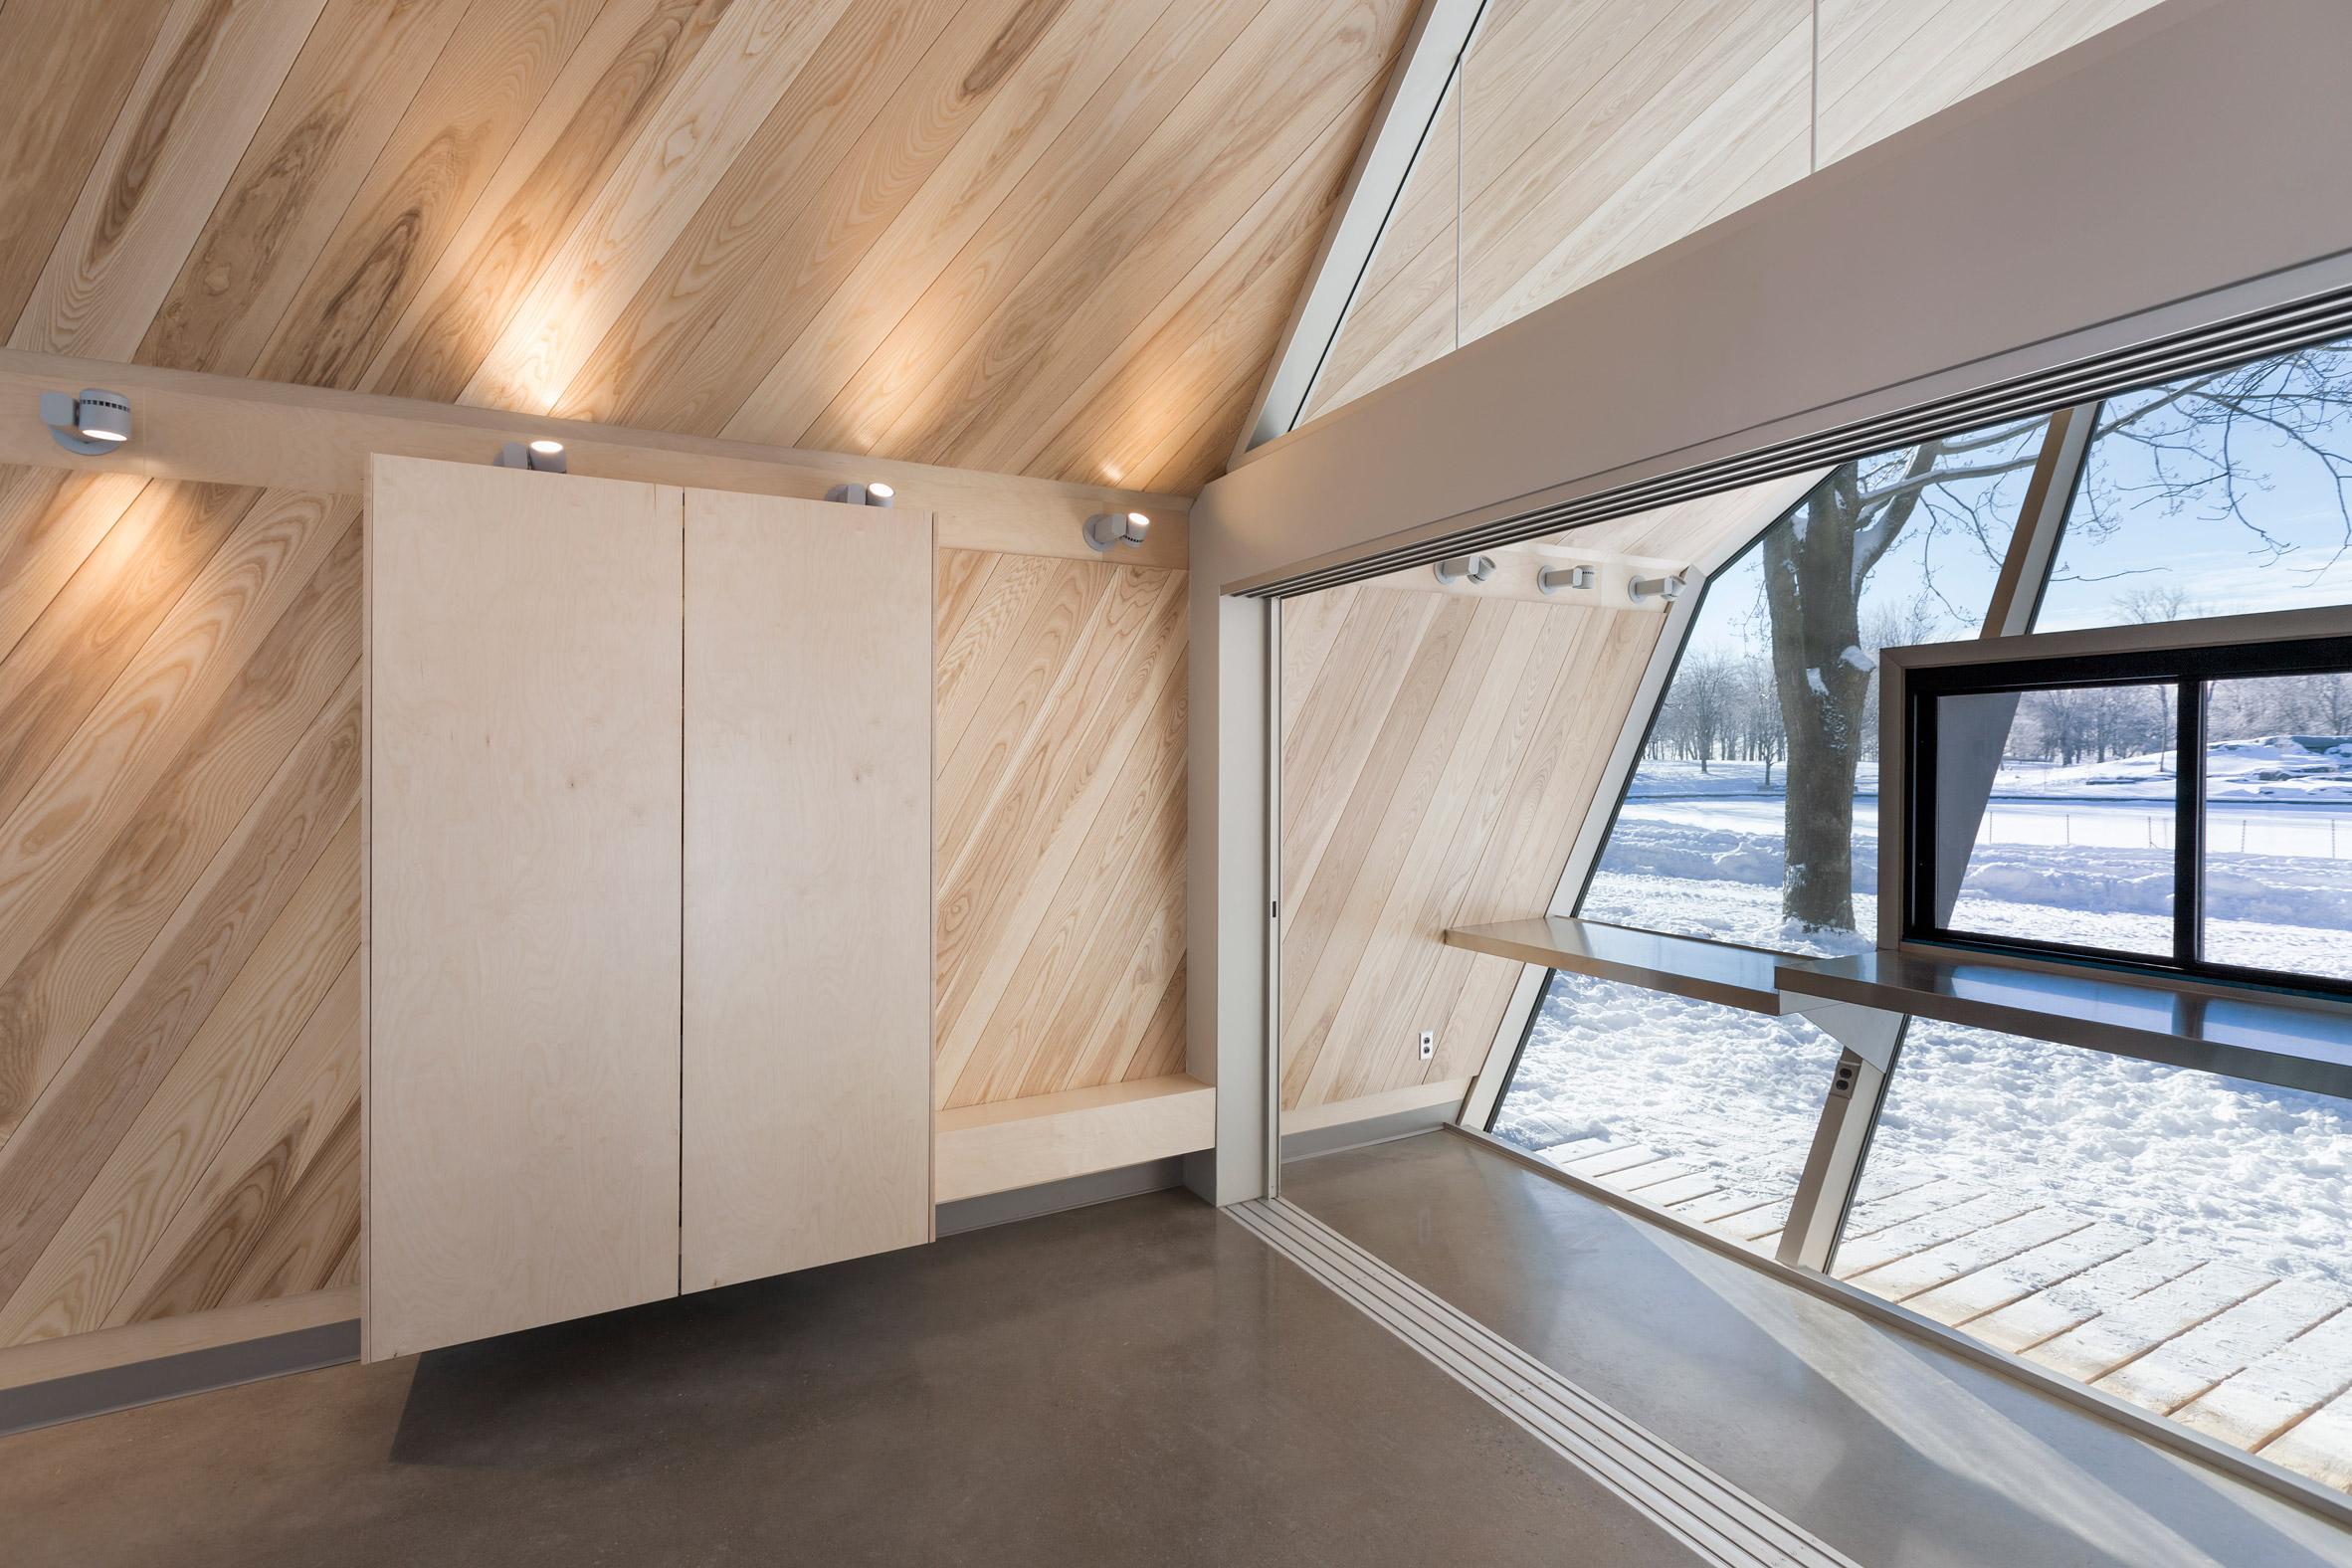 Mount-Royal Kiosks by Atelier Urban Face